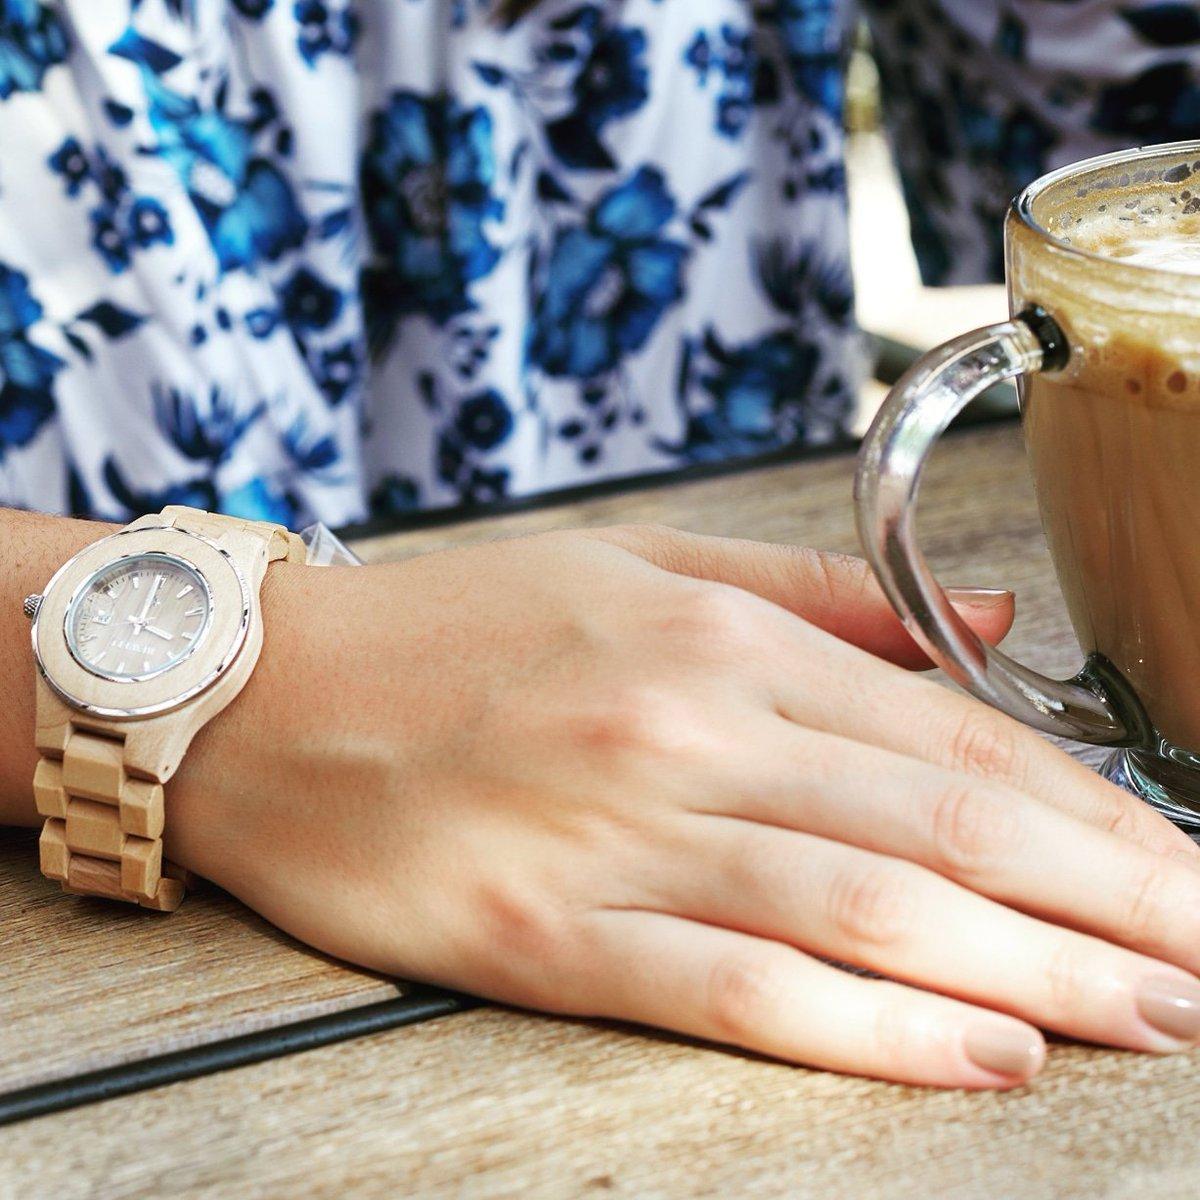 It's more important than ever to take time for you  #igjewelry #jewelrylovers #jewelrylover #stylediaries #whatiwore #jewelry #jewelryaddict #jewelrygram #womensstyle #wristshot #watchgeek #wristgame #timepiece #dapper #watches #watchesofinstagram #watchpics #youtime #horologypic.twitter.com/EXOnmkoQfC